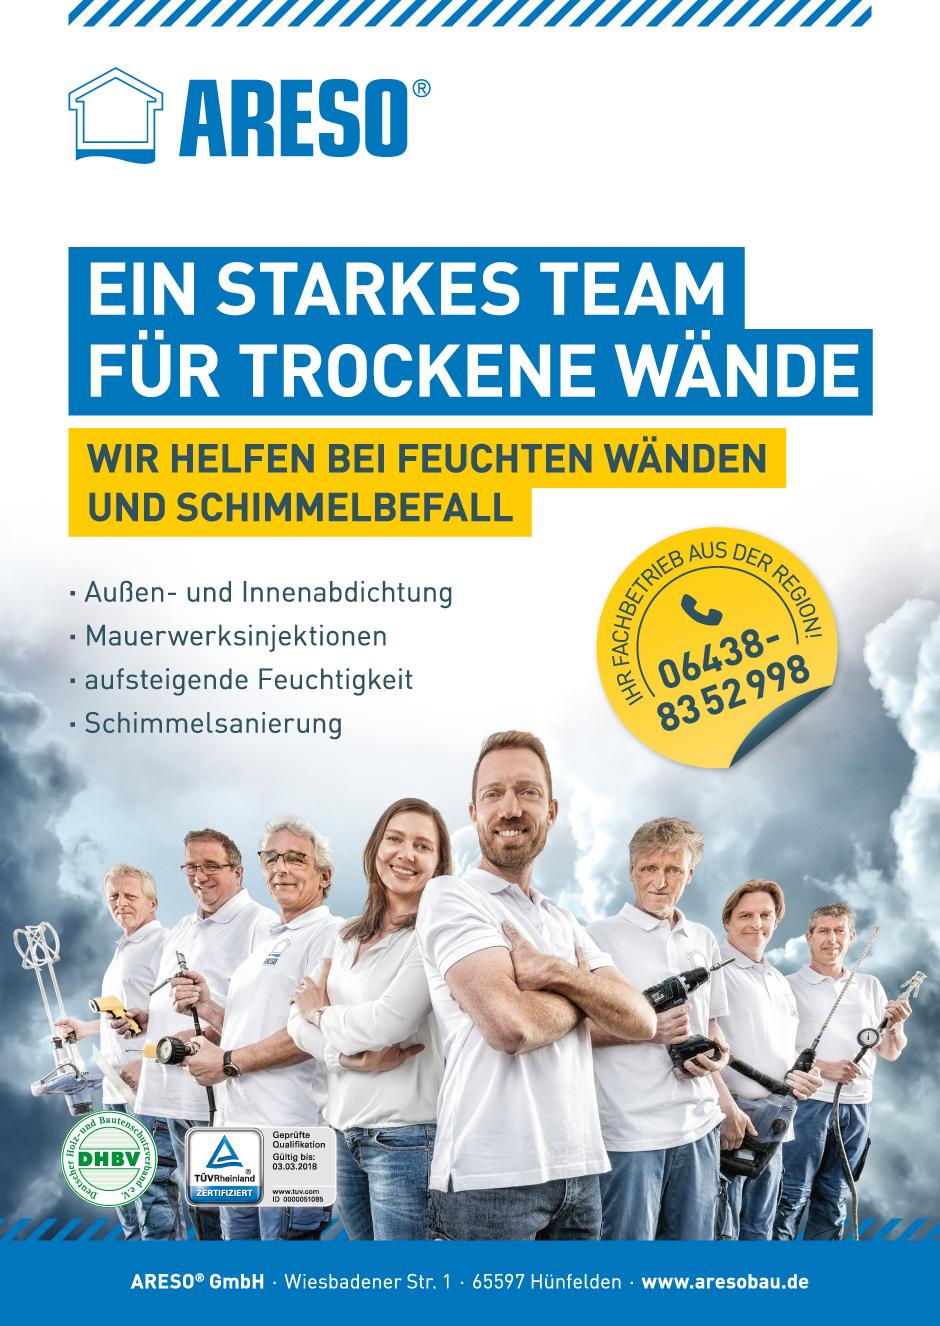 Areso GmbH Hünfelden